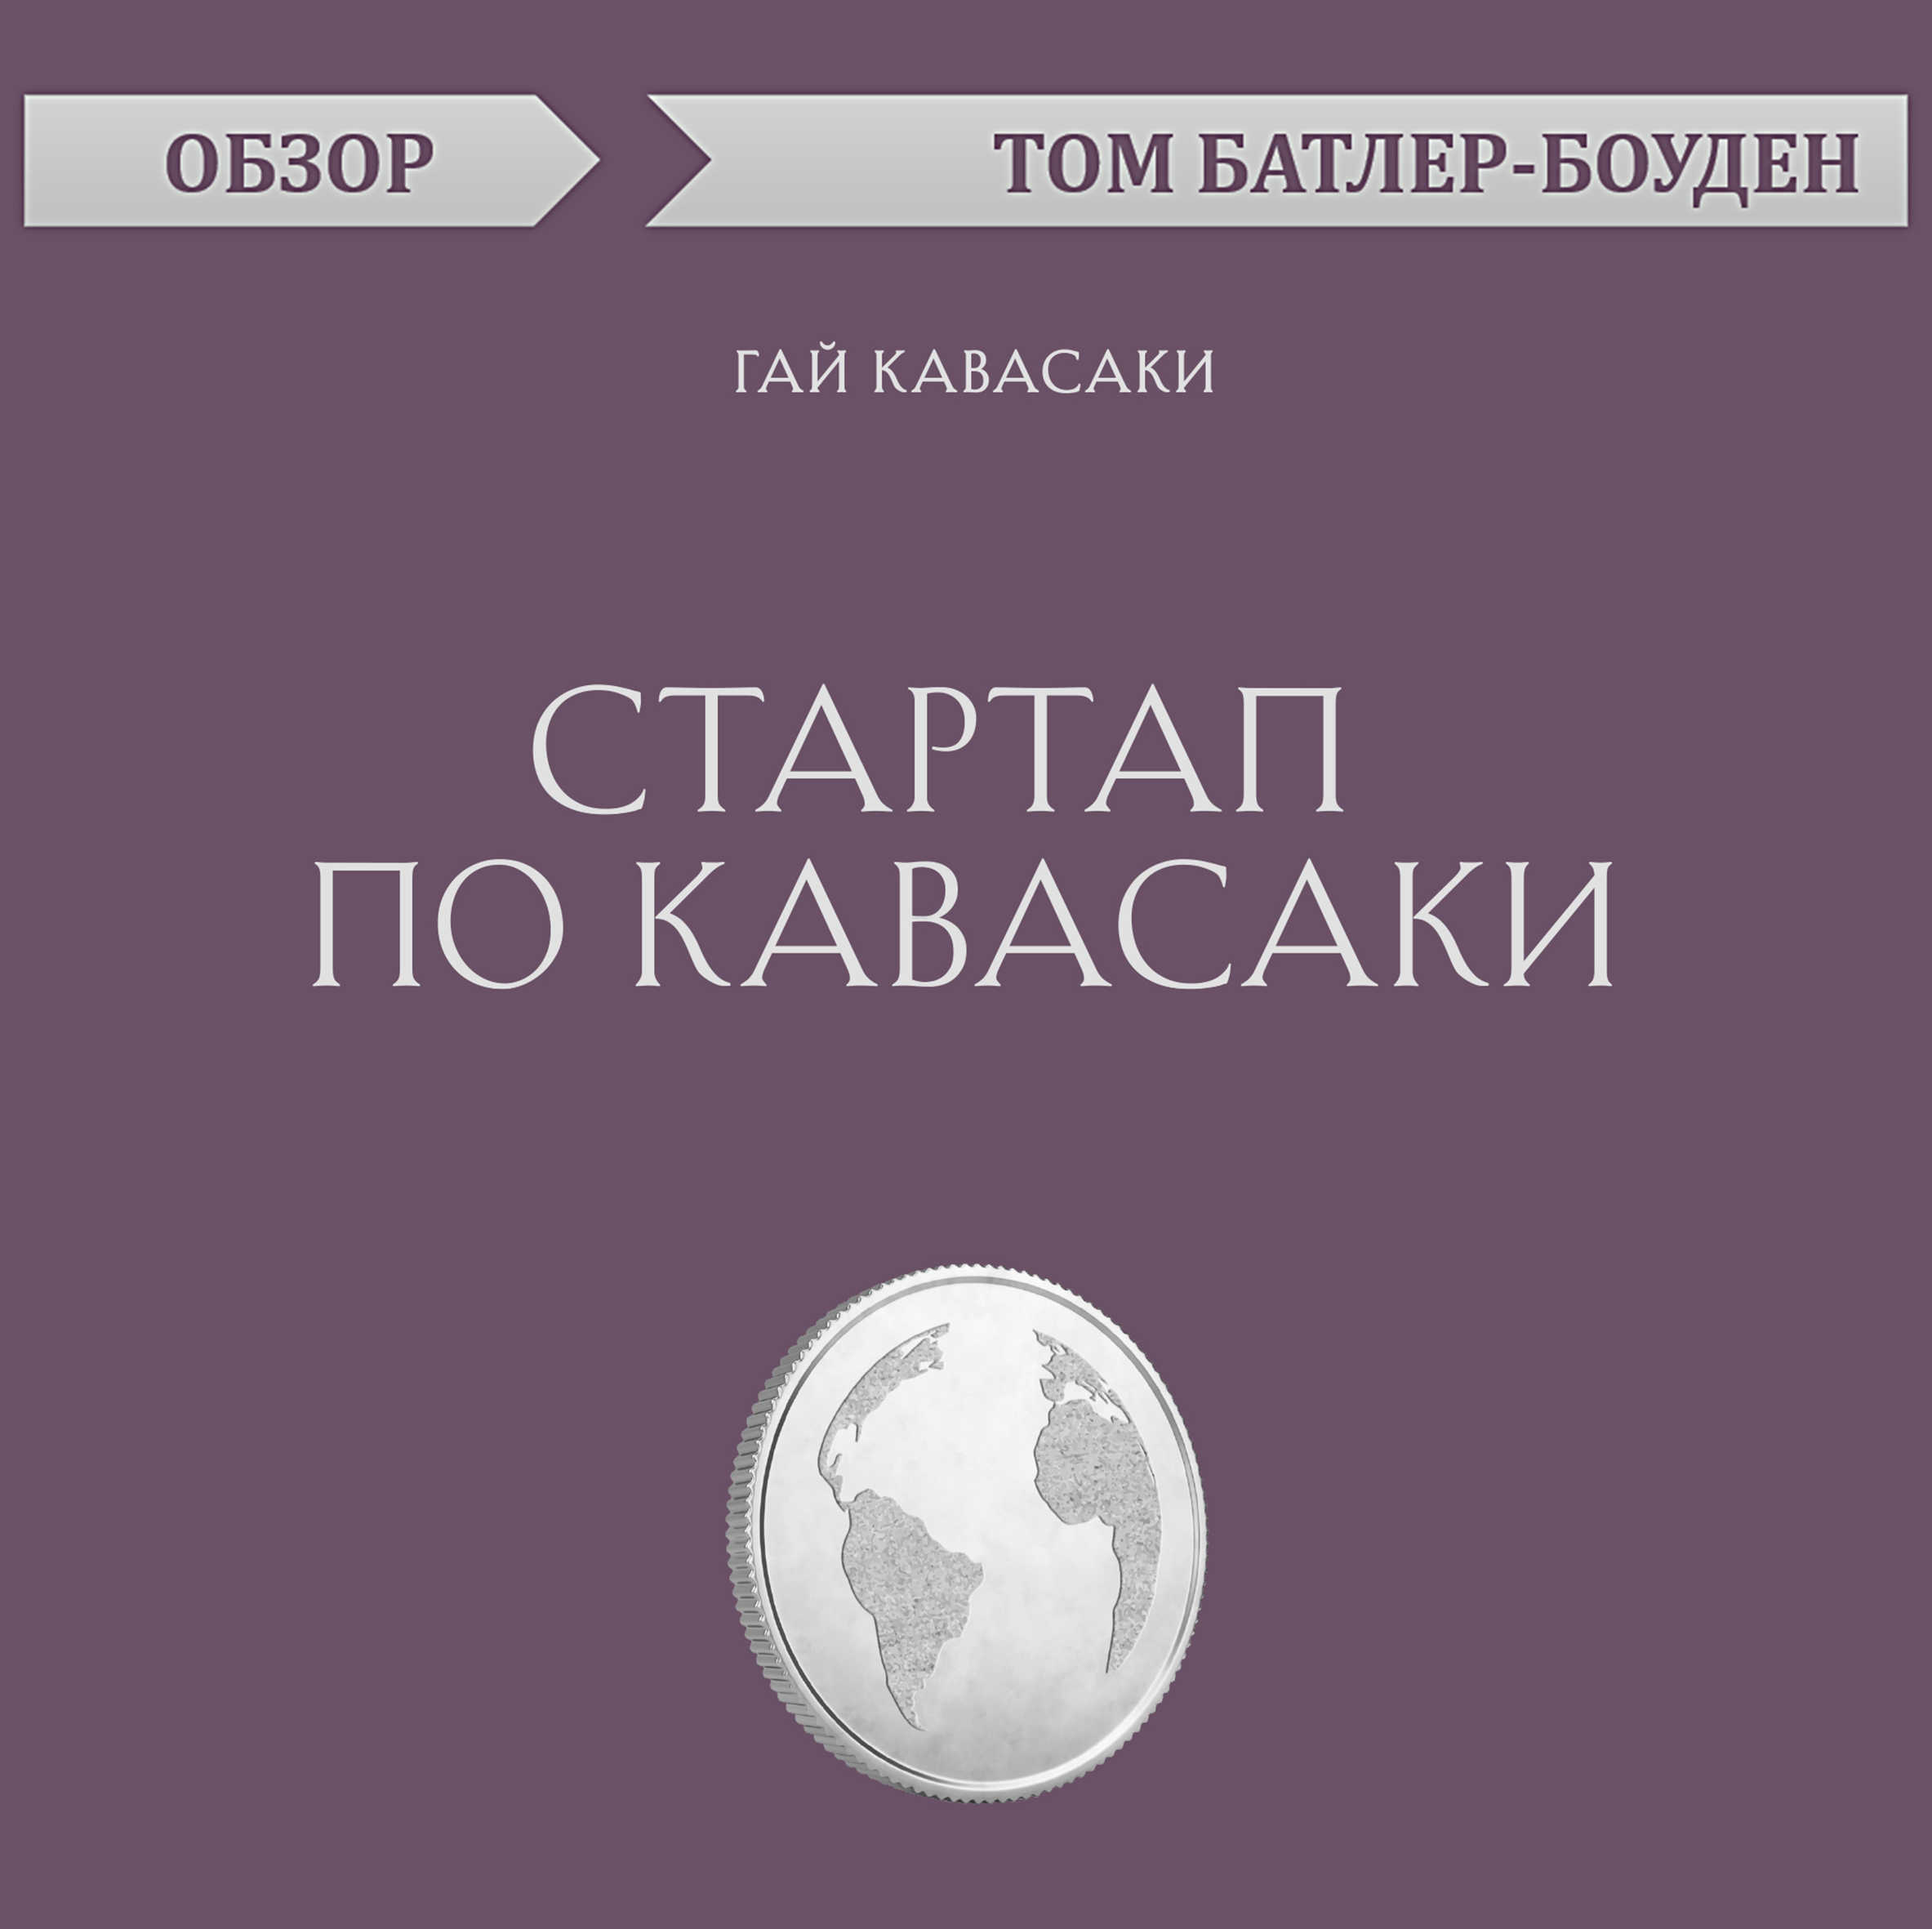 Том Батлер-Боудон Стартап по Кавасаки. Гай Кавасаки (обзор)